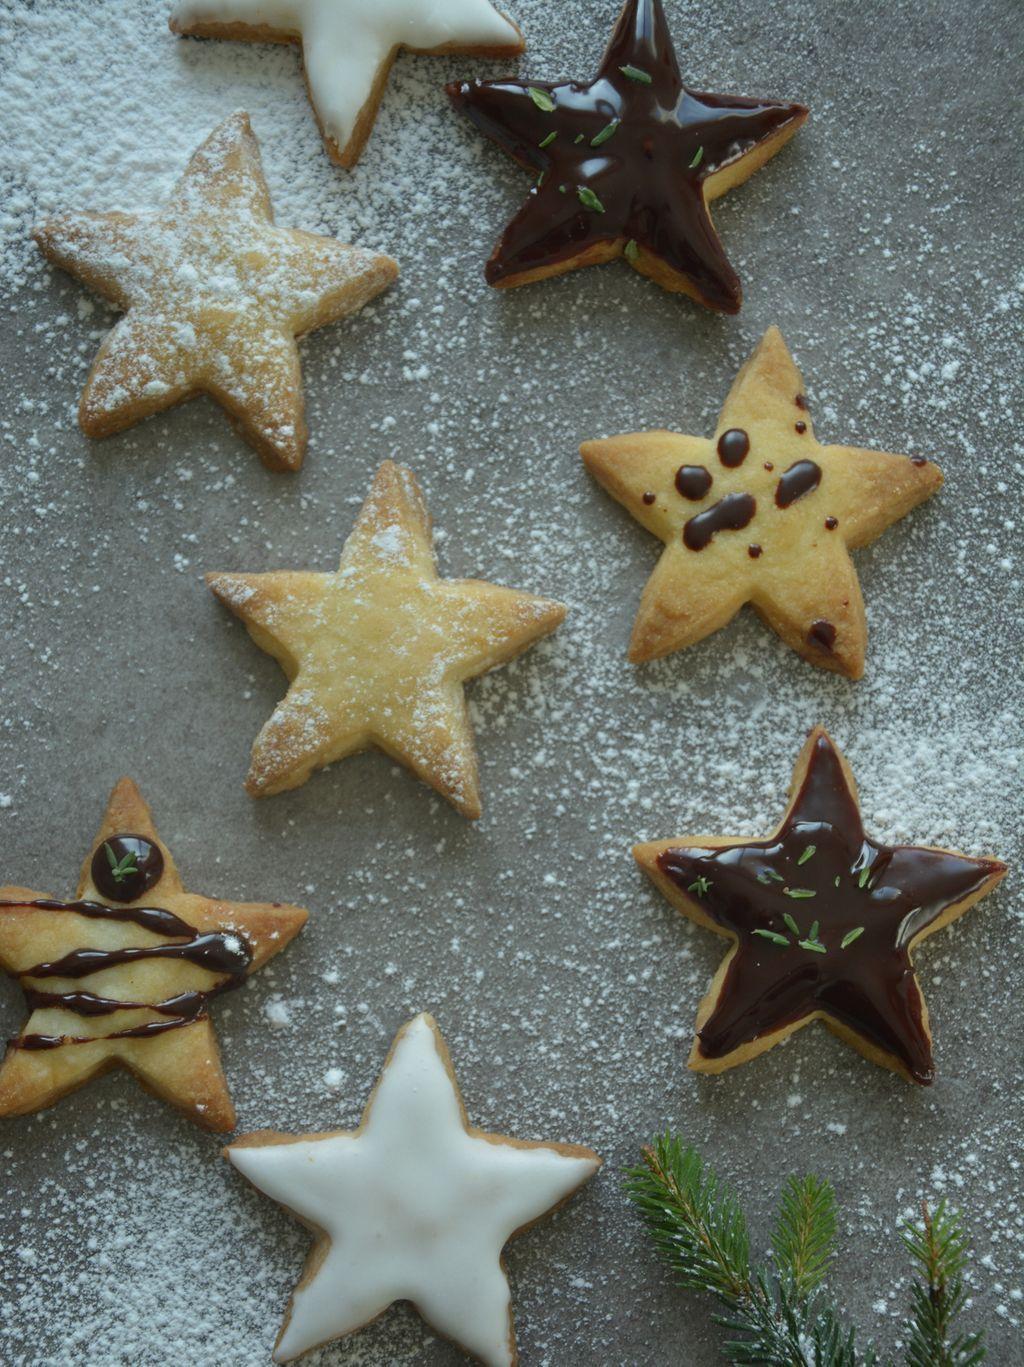 Recette : petits sablés de Noël! #sabledenoel Recette : petits sablés de Noël! - Modes&Travaux #sabledenoel